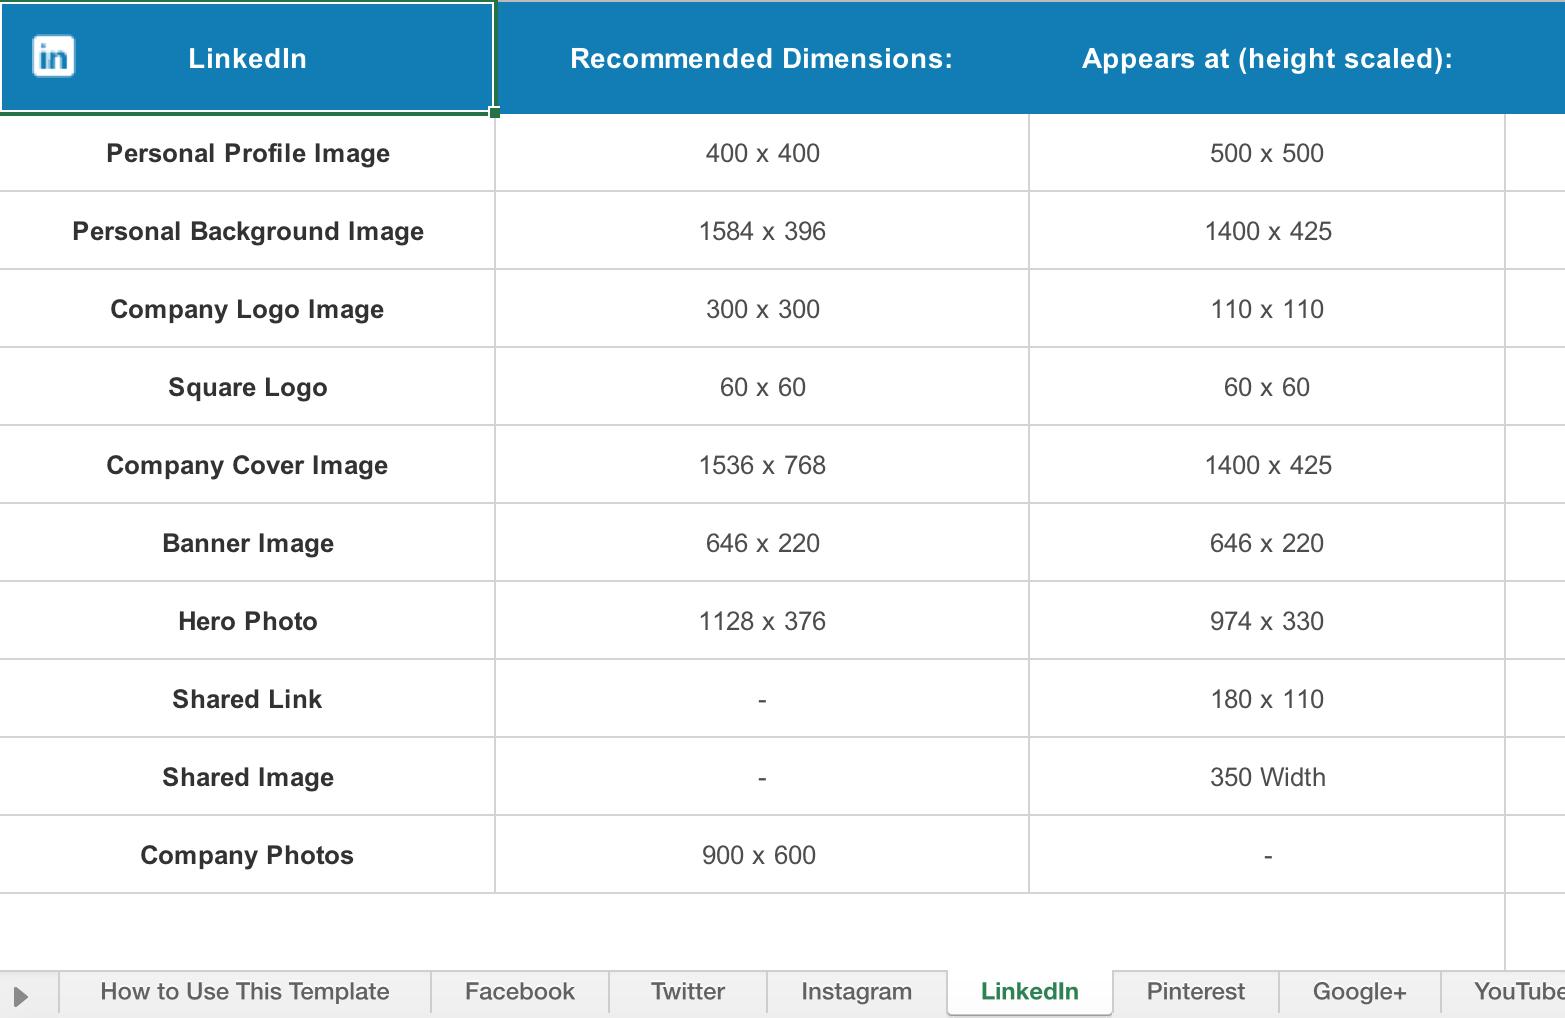 Social Media Image Requirements